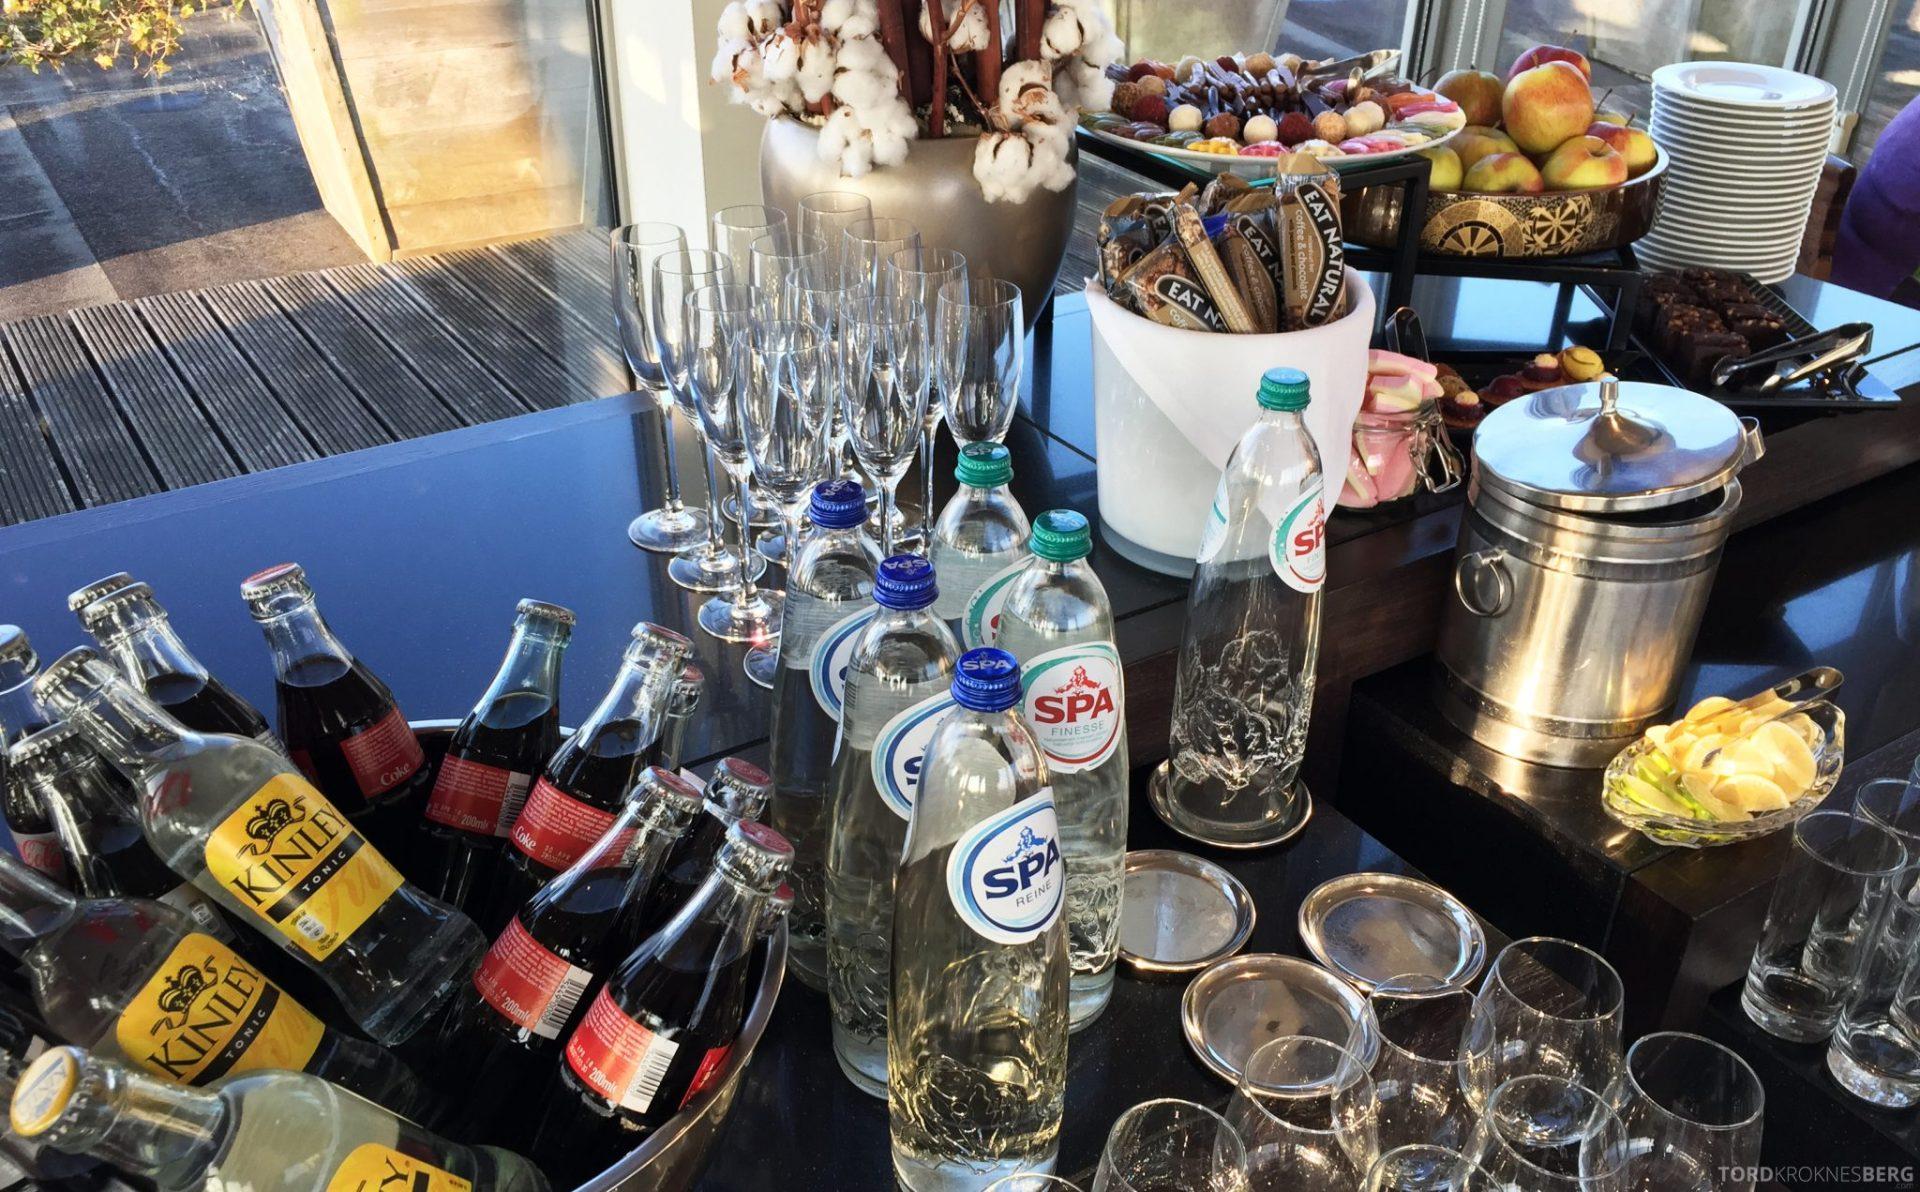 Hilton Amsterdam Executive Lounge drikke